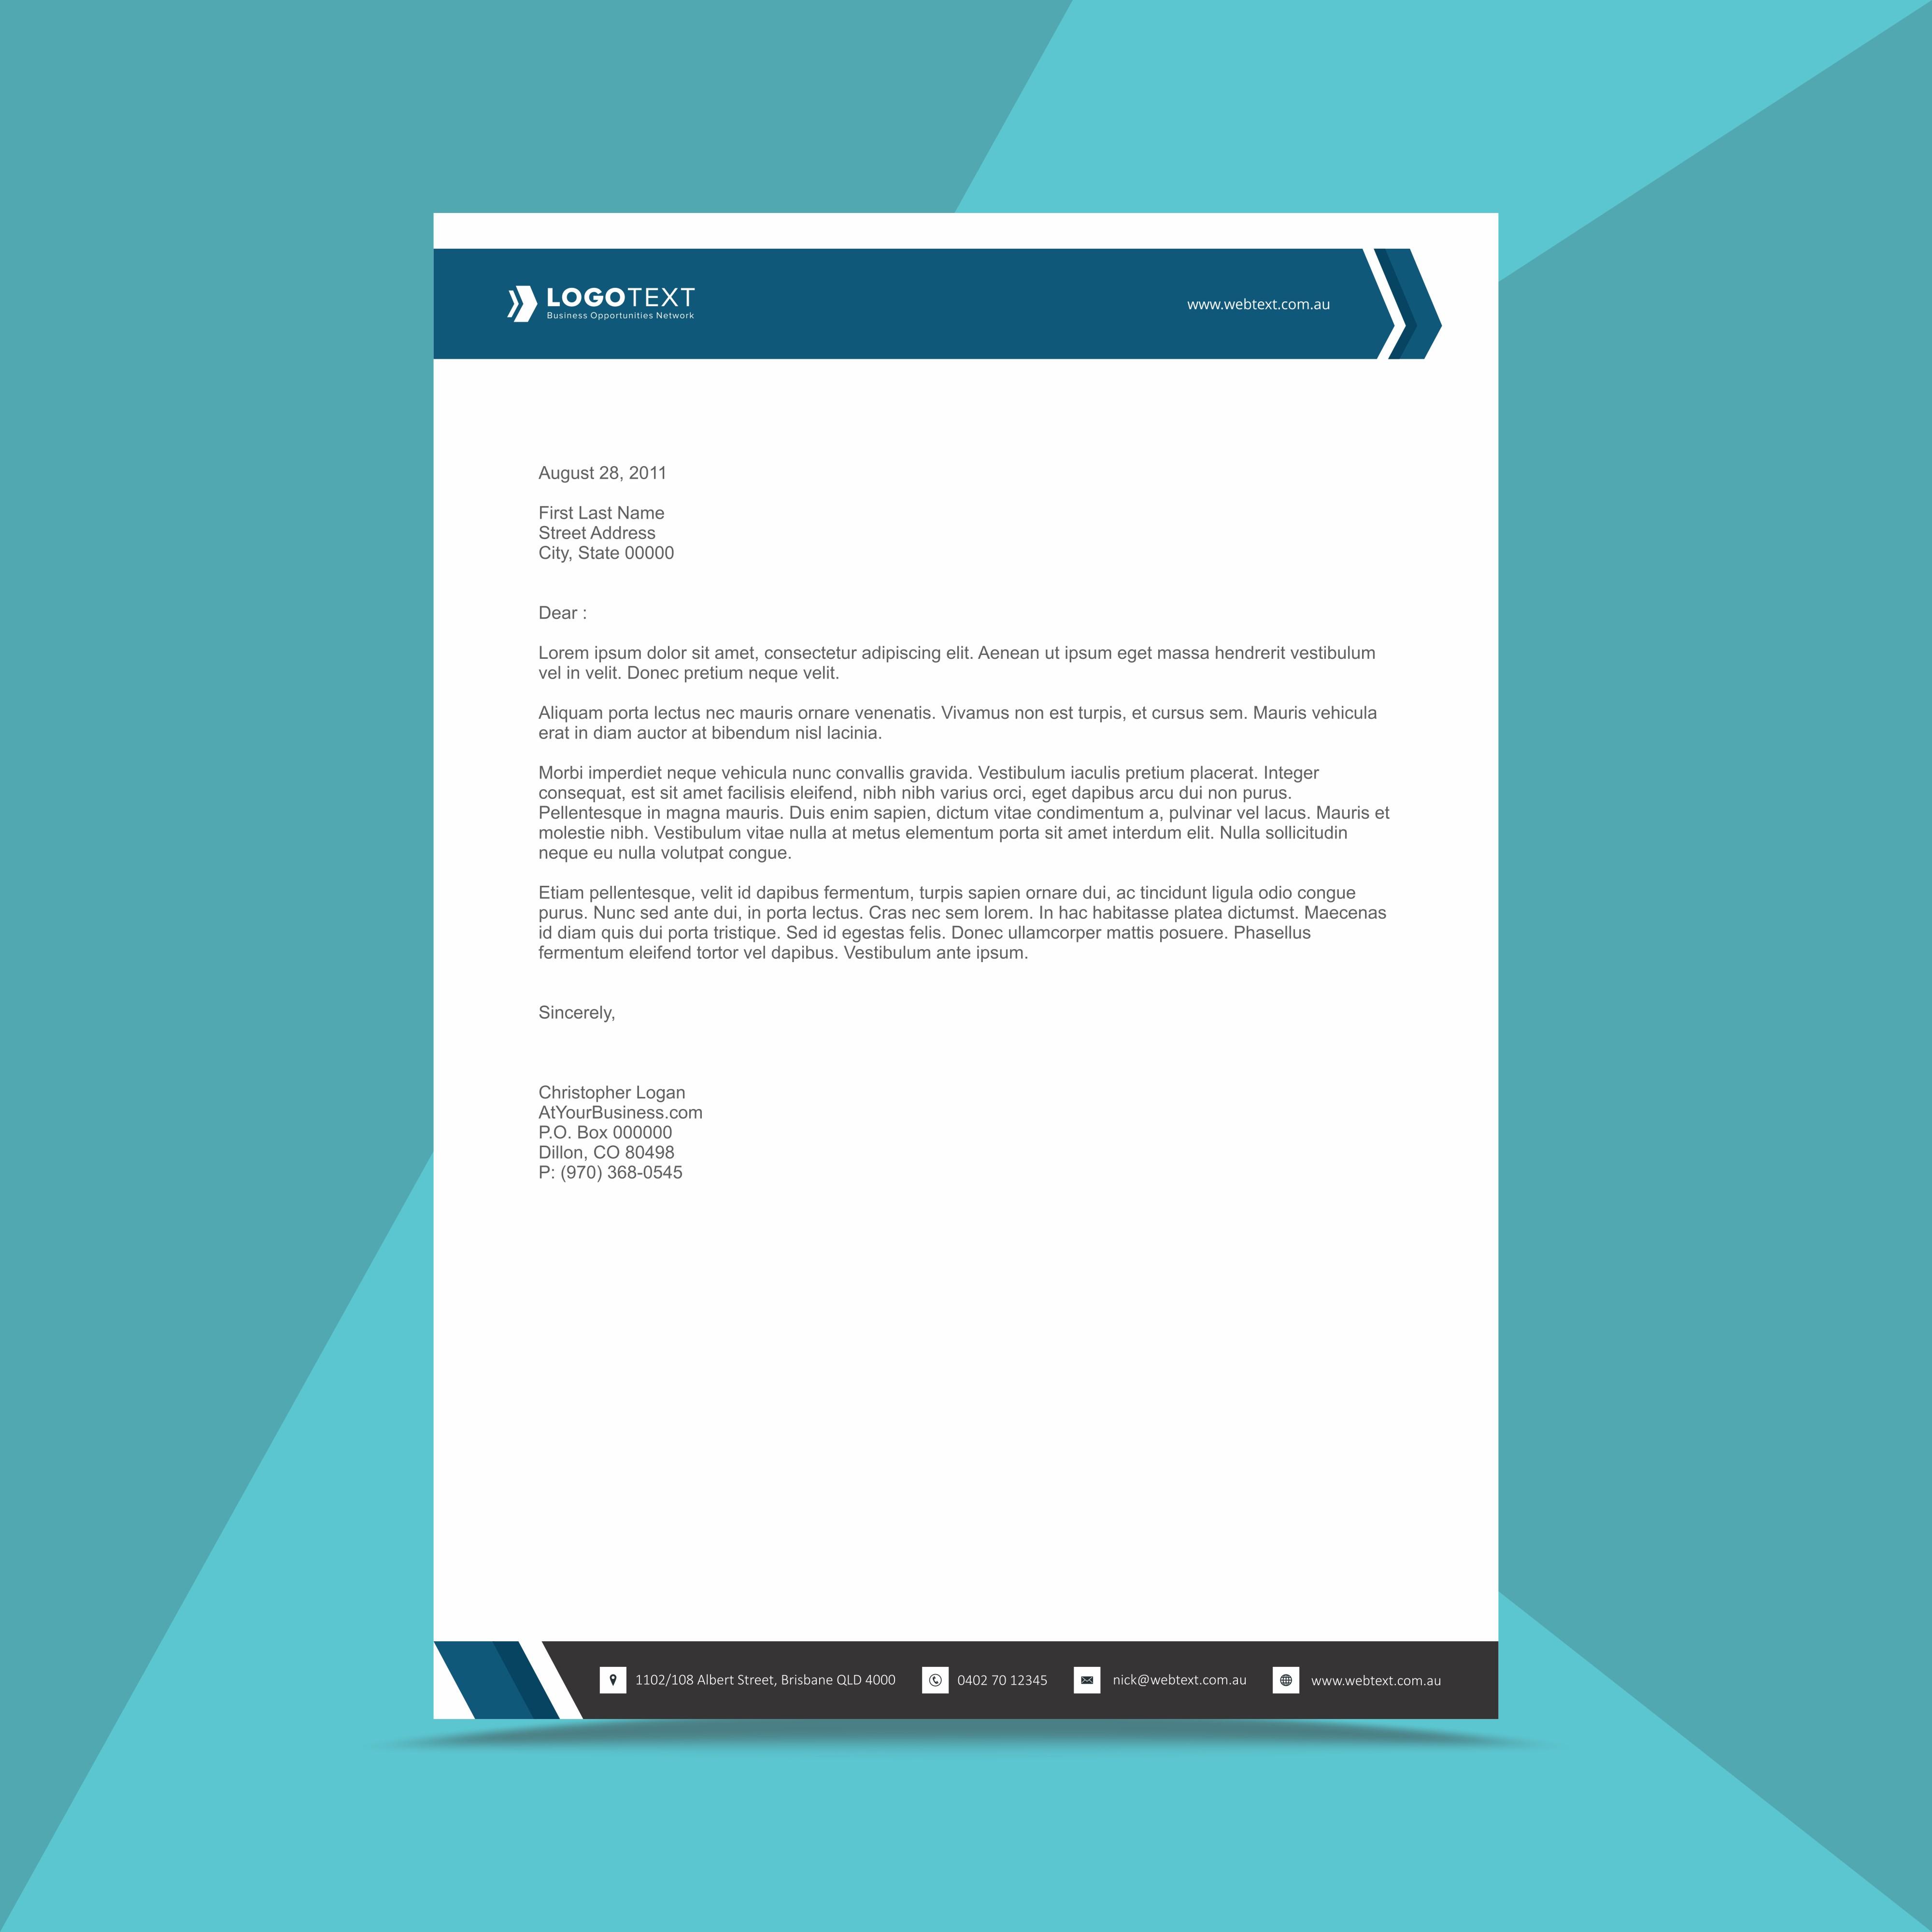 Letterhead Design Vector: Professional Business Letterhead Design Template